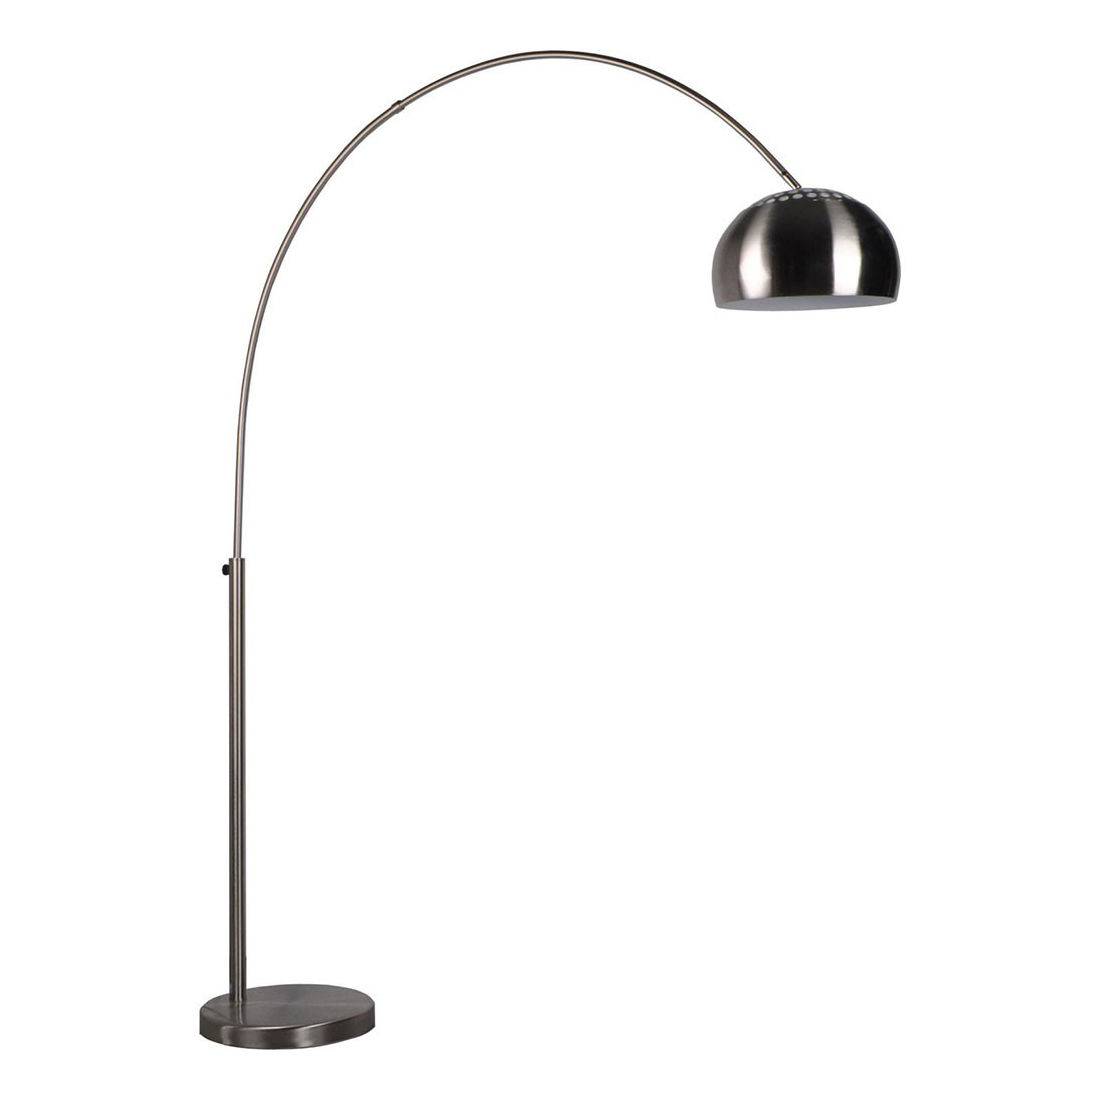 Big Bow vloerlamp Luzo rvs